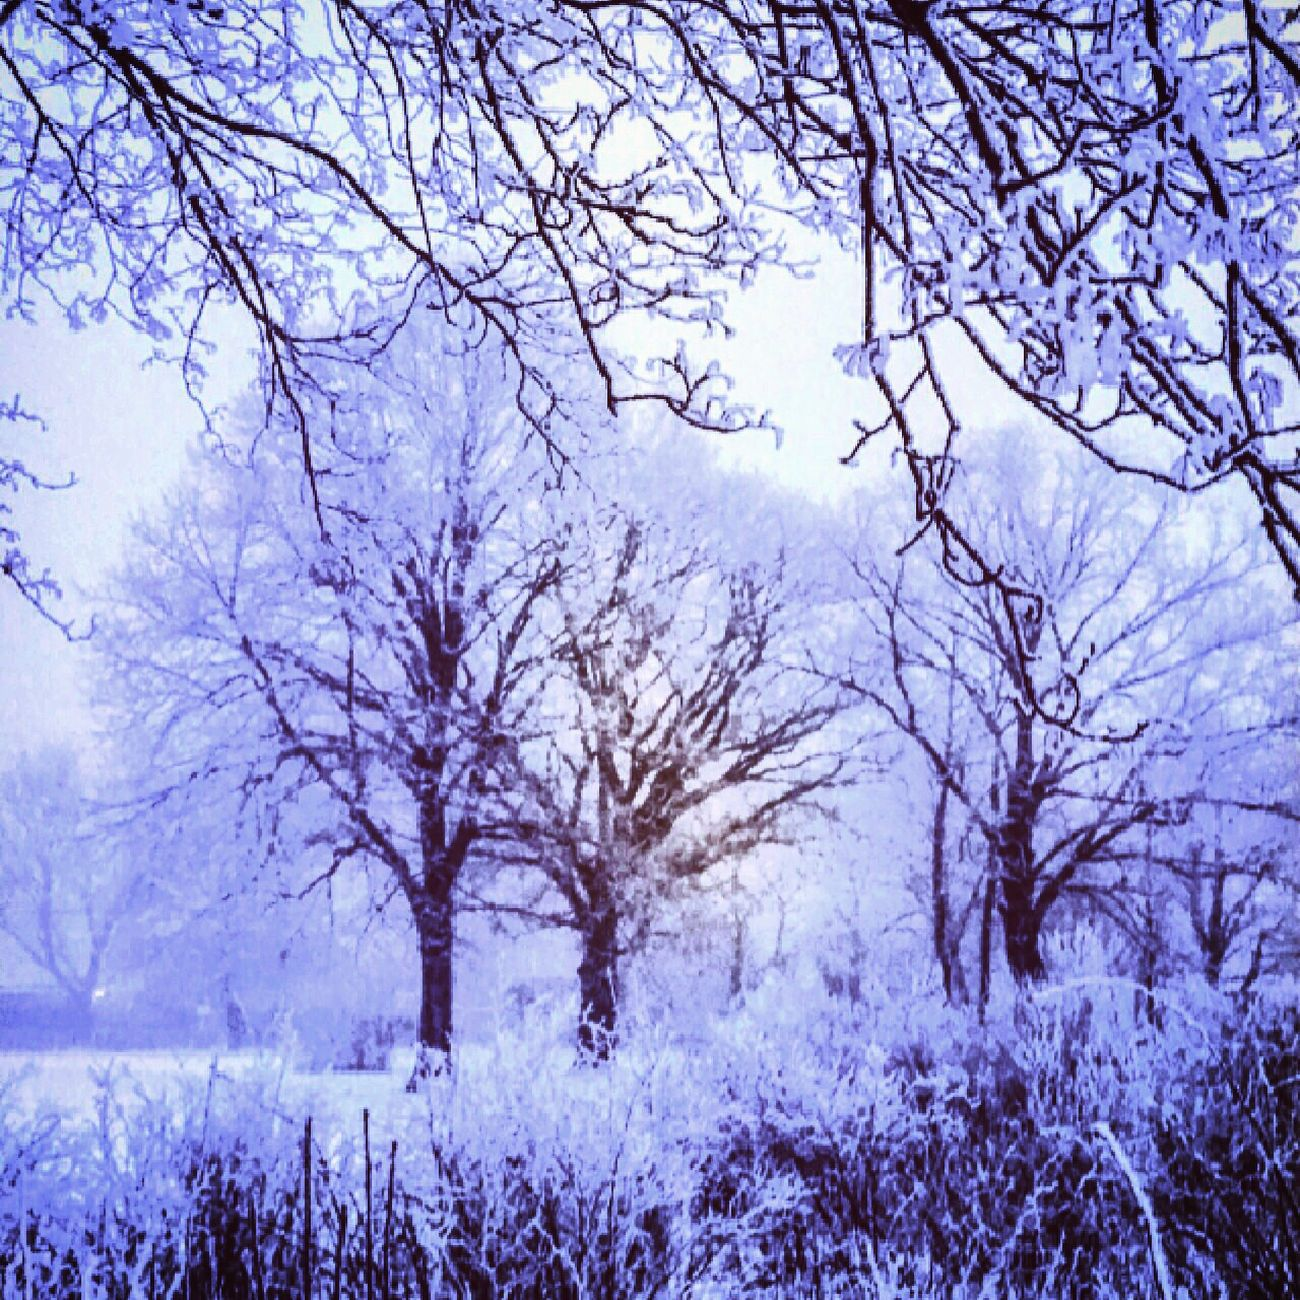 Foto Astorp Photography Fotografi Wintertime Winter Winterwonderland Vinter Vinterbild